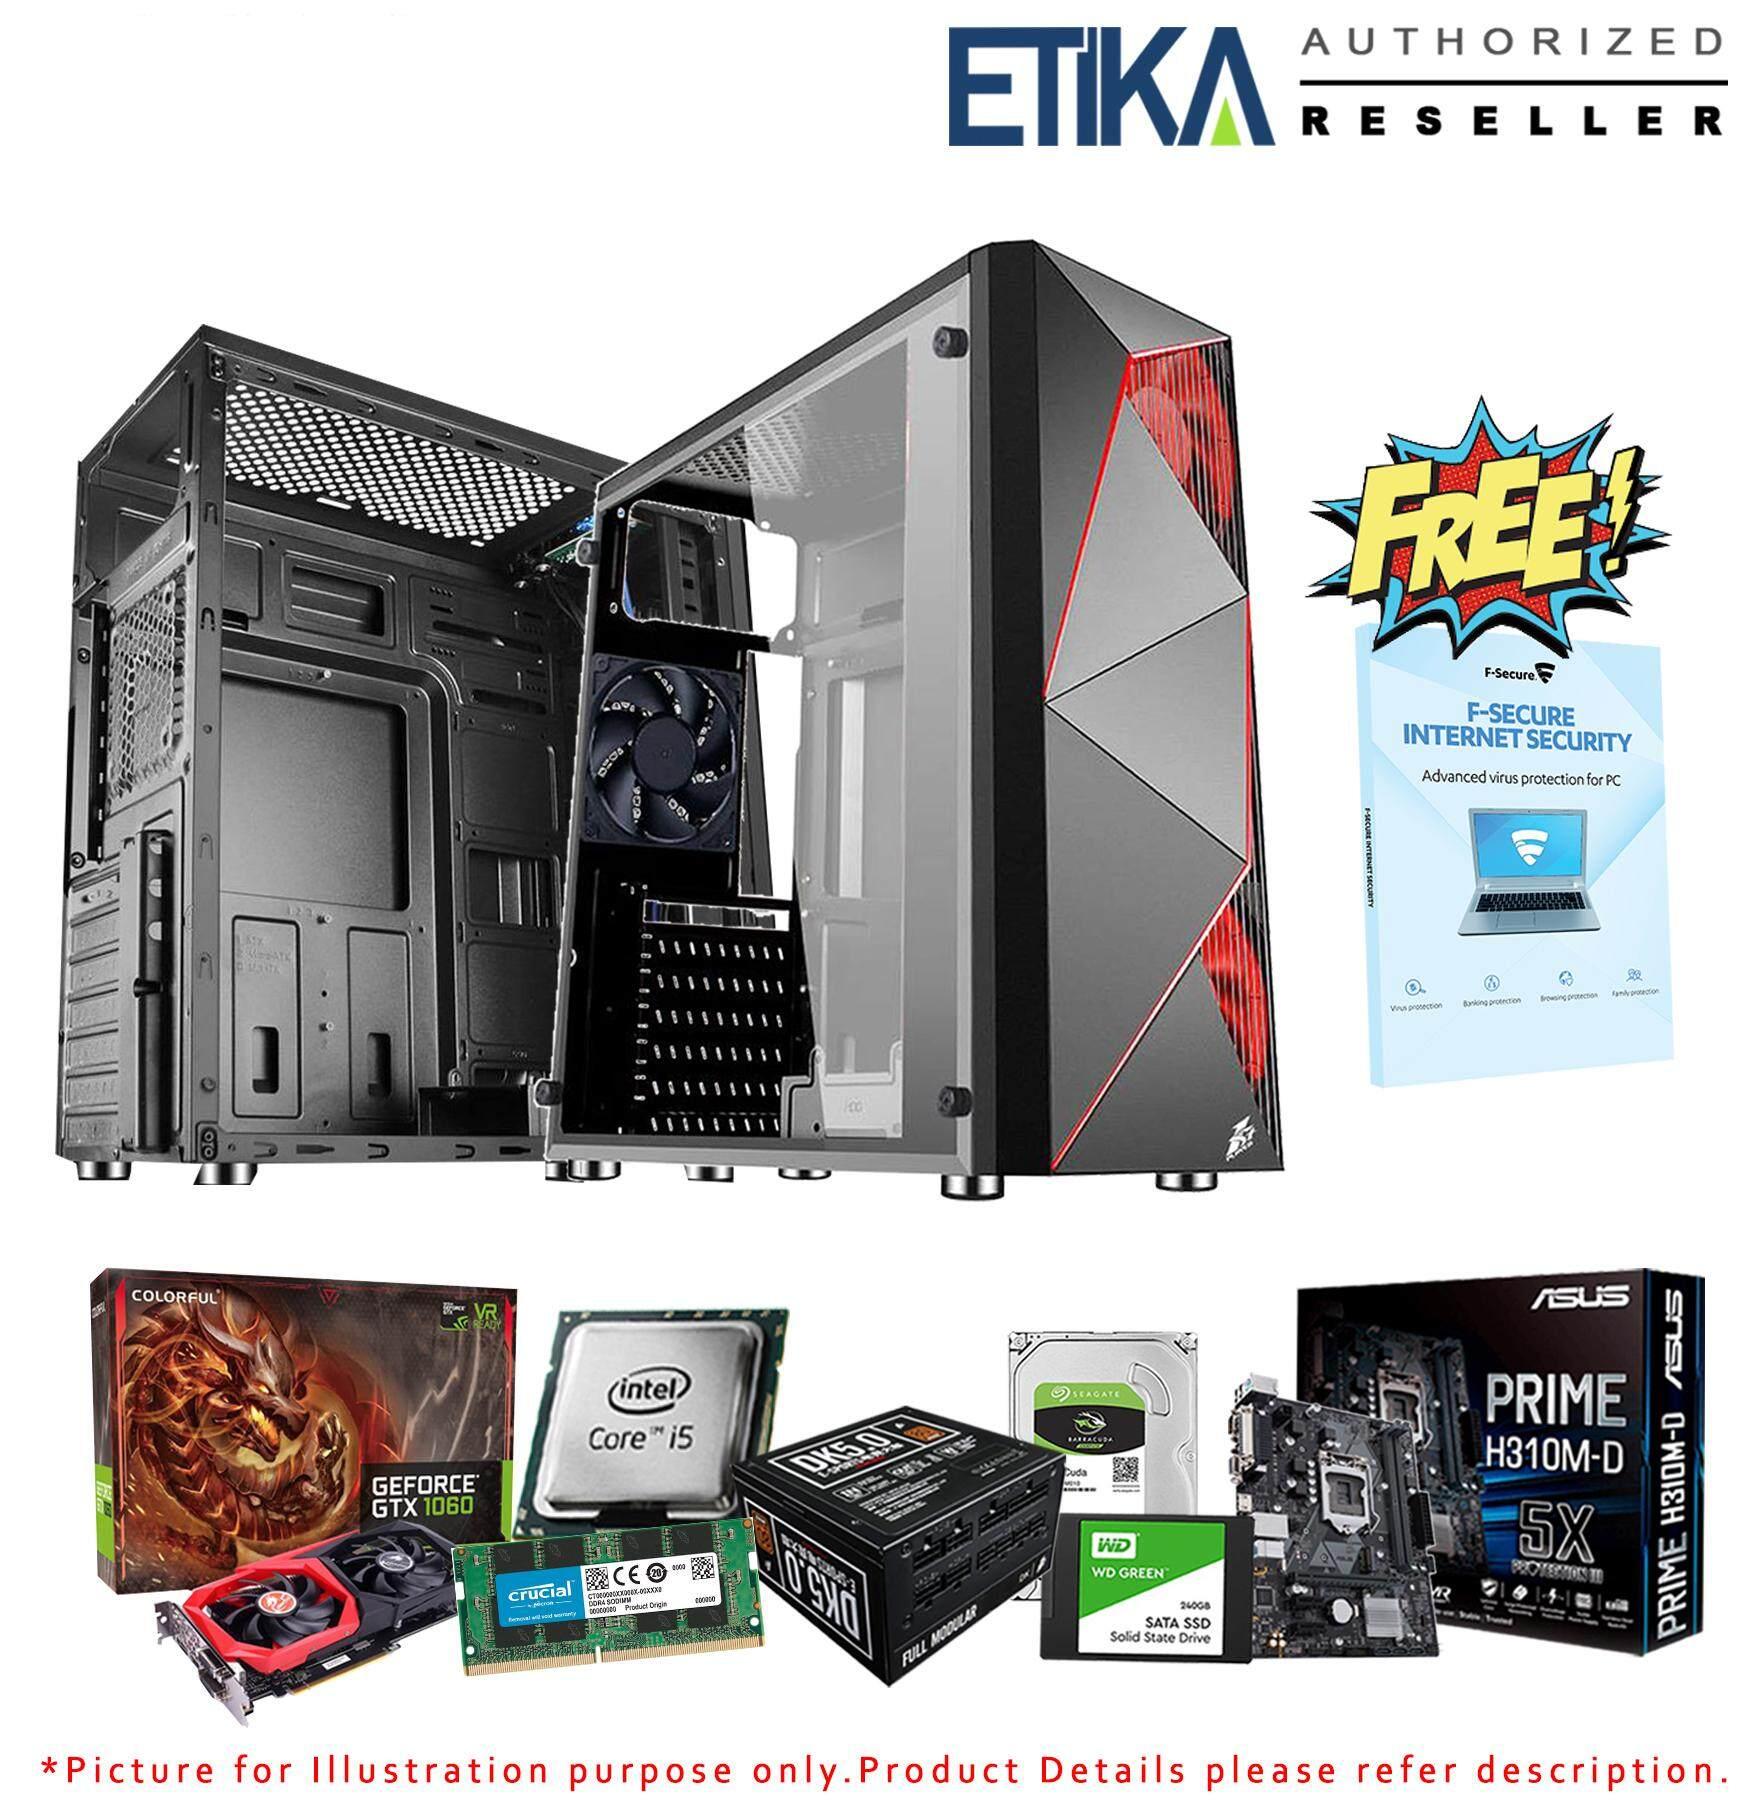 Diy Gaming Pc Package - Intel I5-8400, 8gb Ddr4, 240gb+1tb Hdd, 6gb Gtx1060 By Etika Komputer S/b.